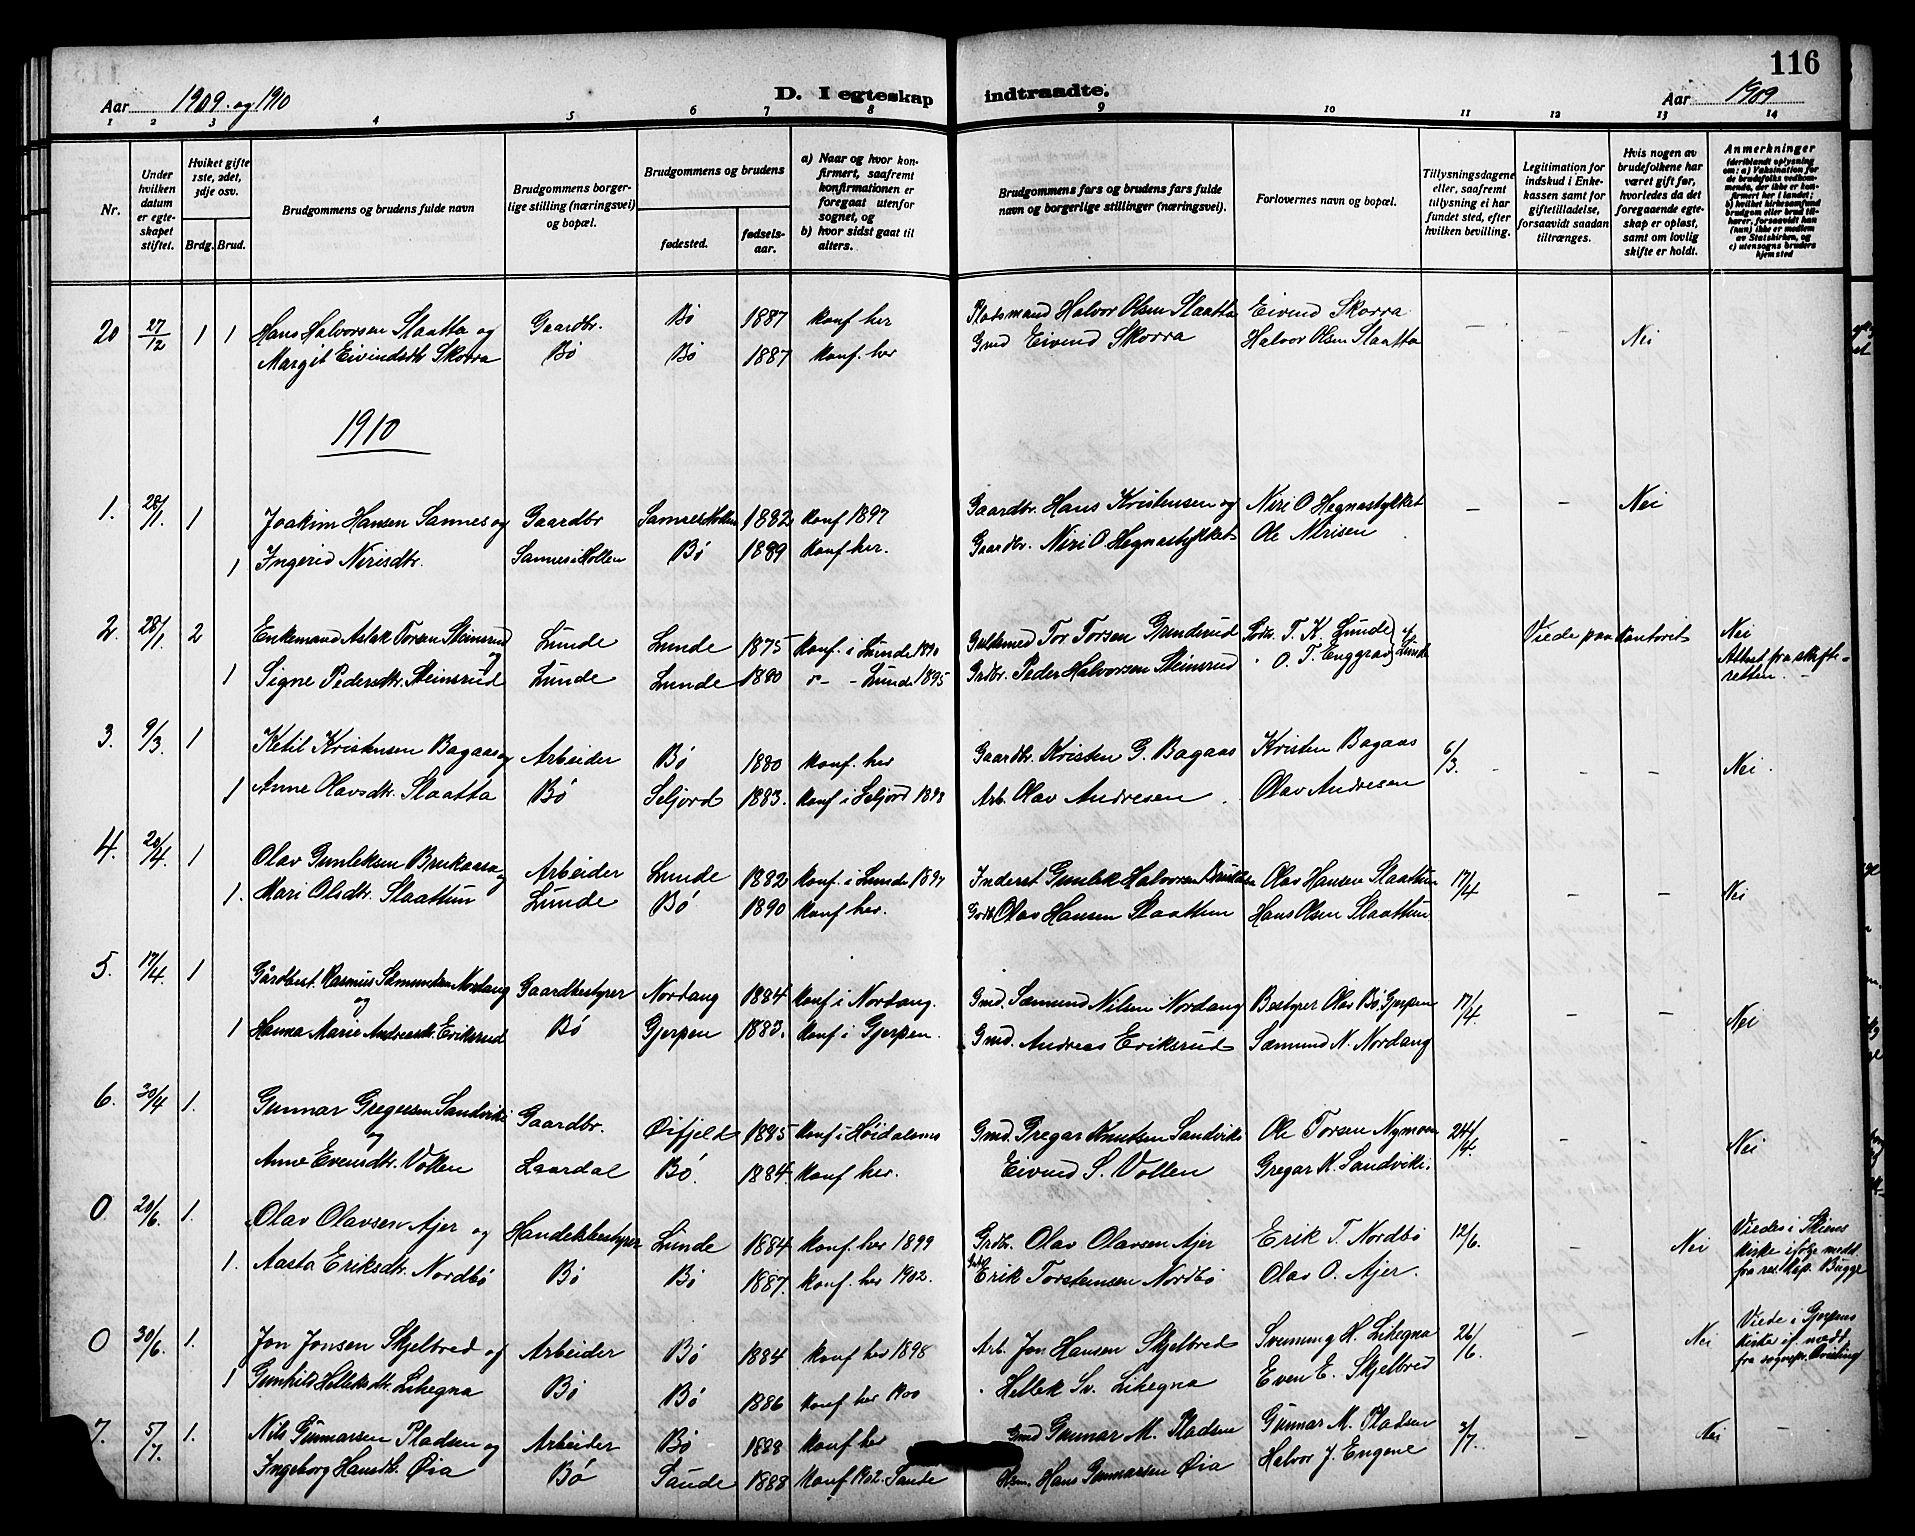 SAKO, Bø kirkebøker, G/Ga/L0007: Klokkerbok nr. 7, 1909-1924, s. 116